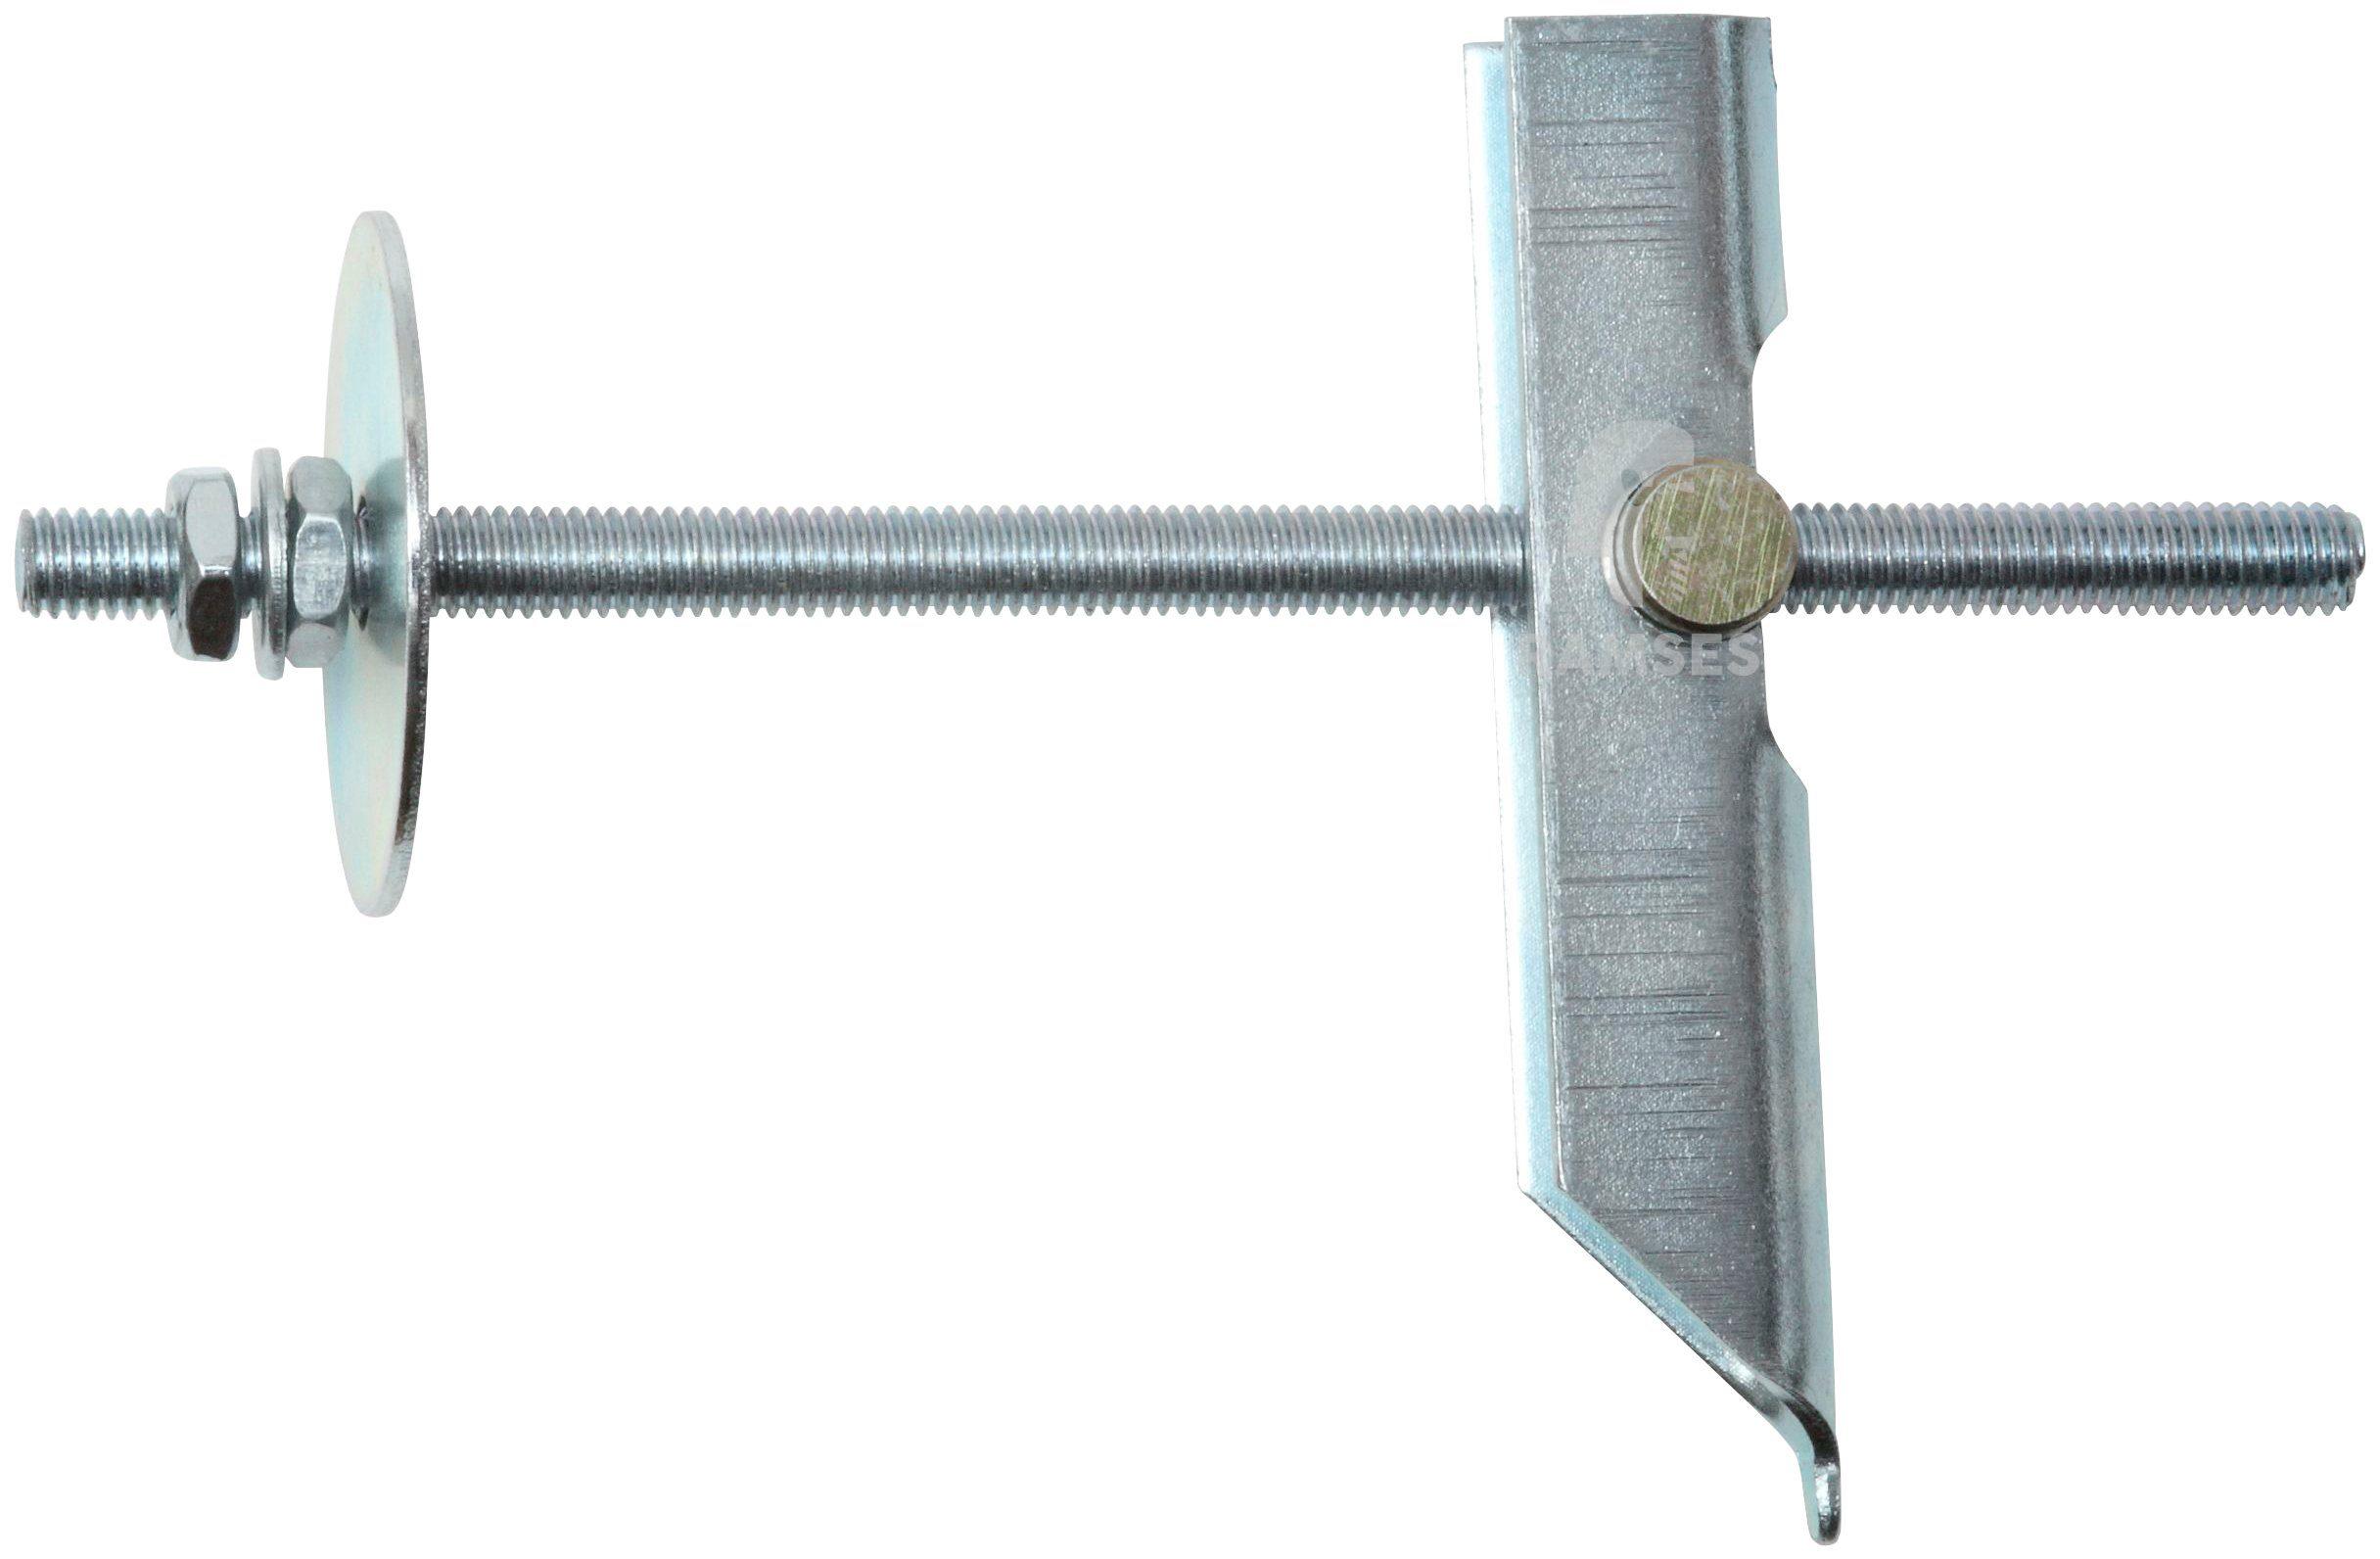 RAMSES Dübel , Kippdübel mit Haken M6 x 100 mm, 50 Stück